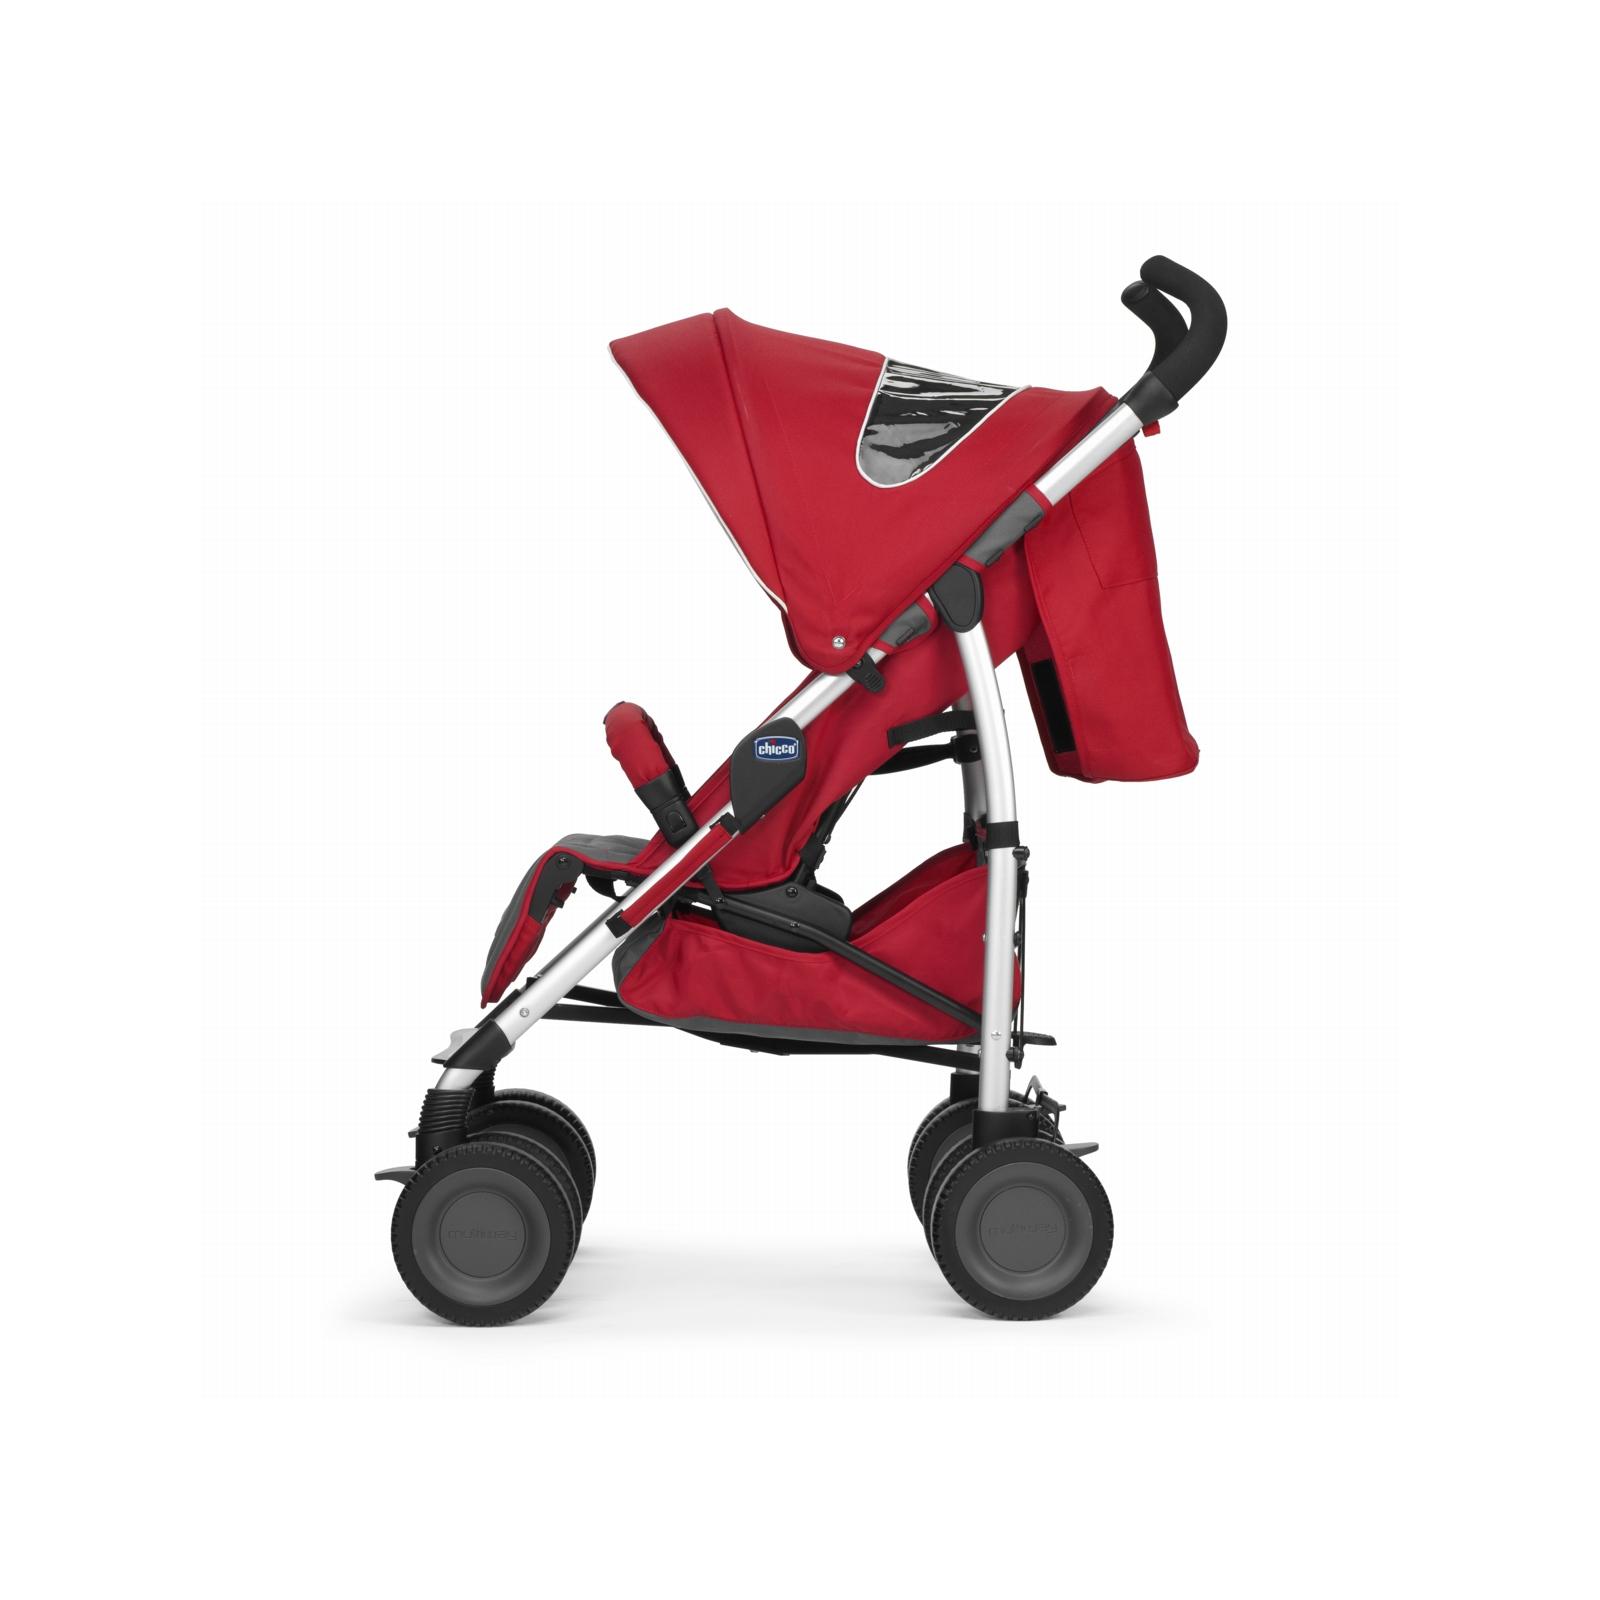 Коляска Chicco Multiway Evo Stroller Red (79315.70) изображение 3